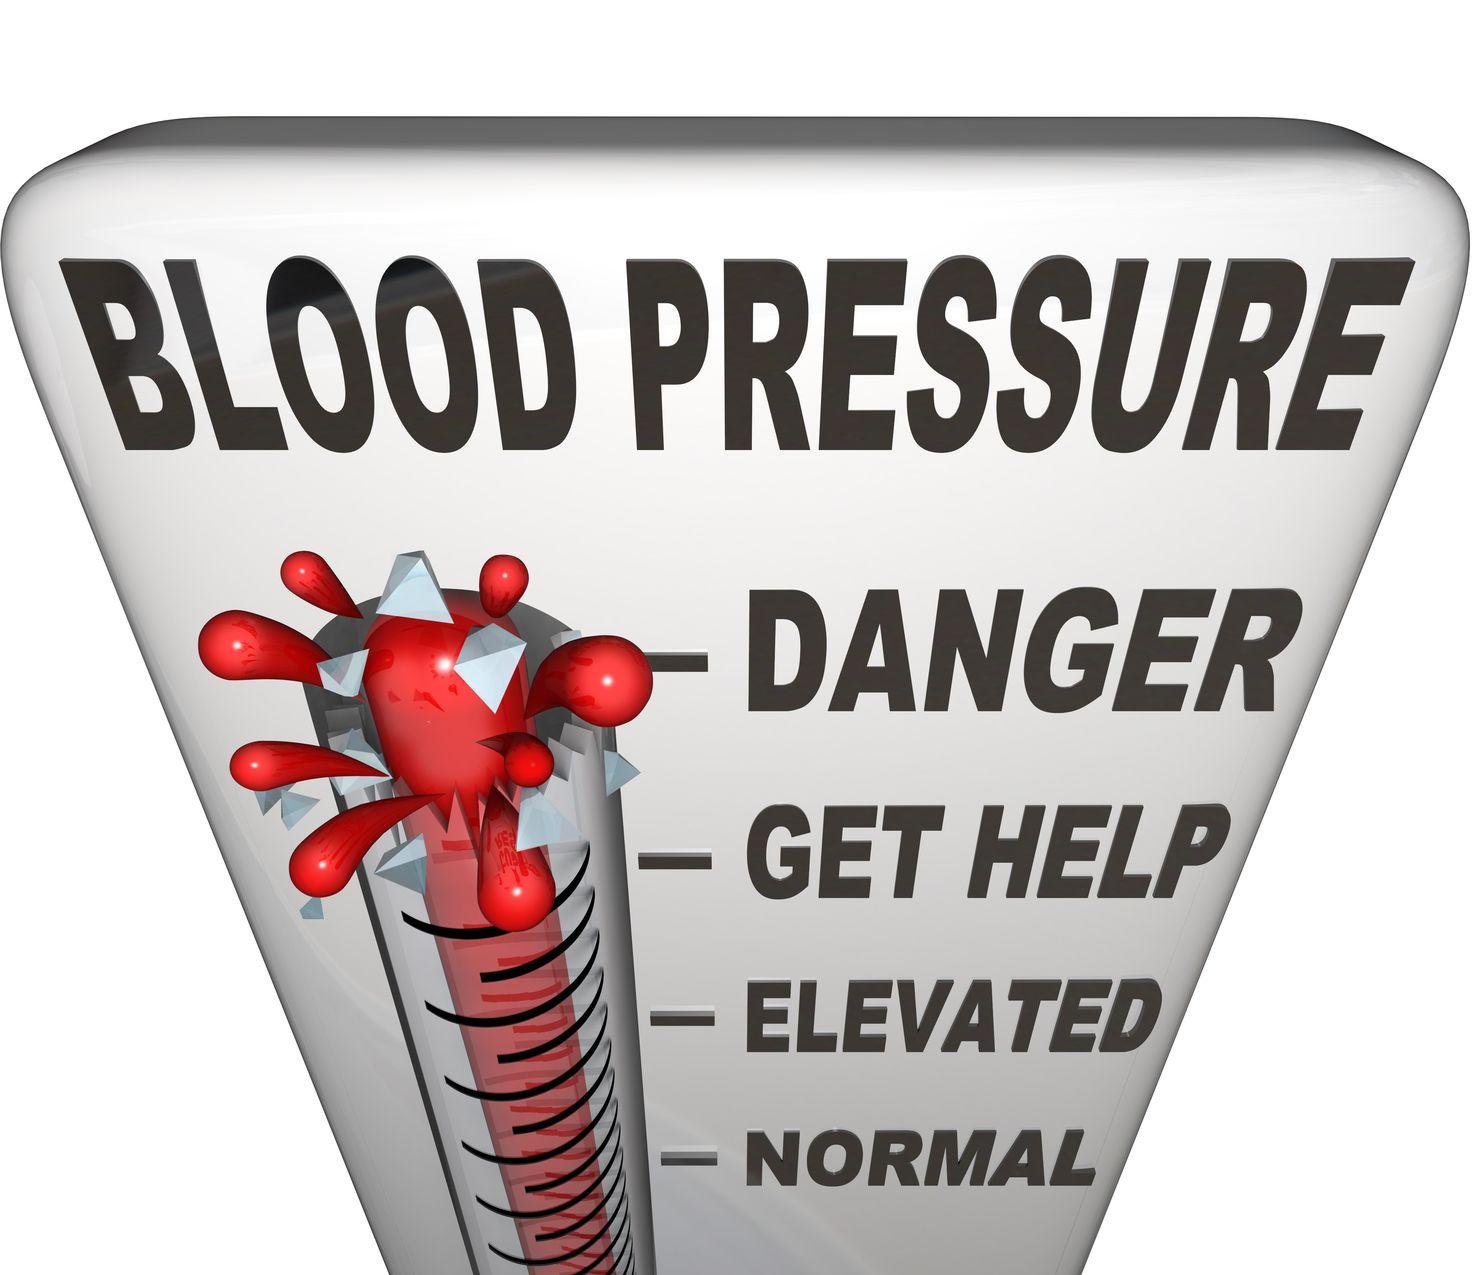 Reasons For High Blood Pressure  https://www.info-on-high-blood-pressure.com/reasonsforhighbloodpressure.html